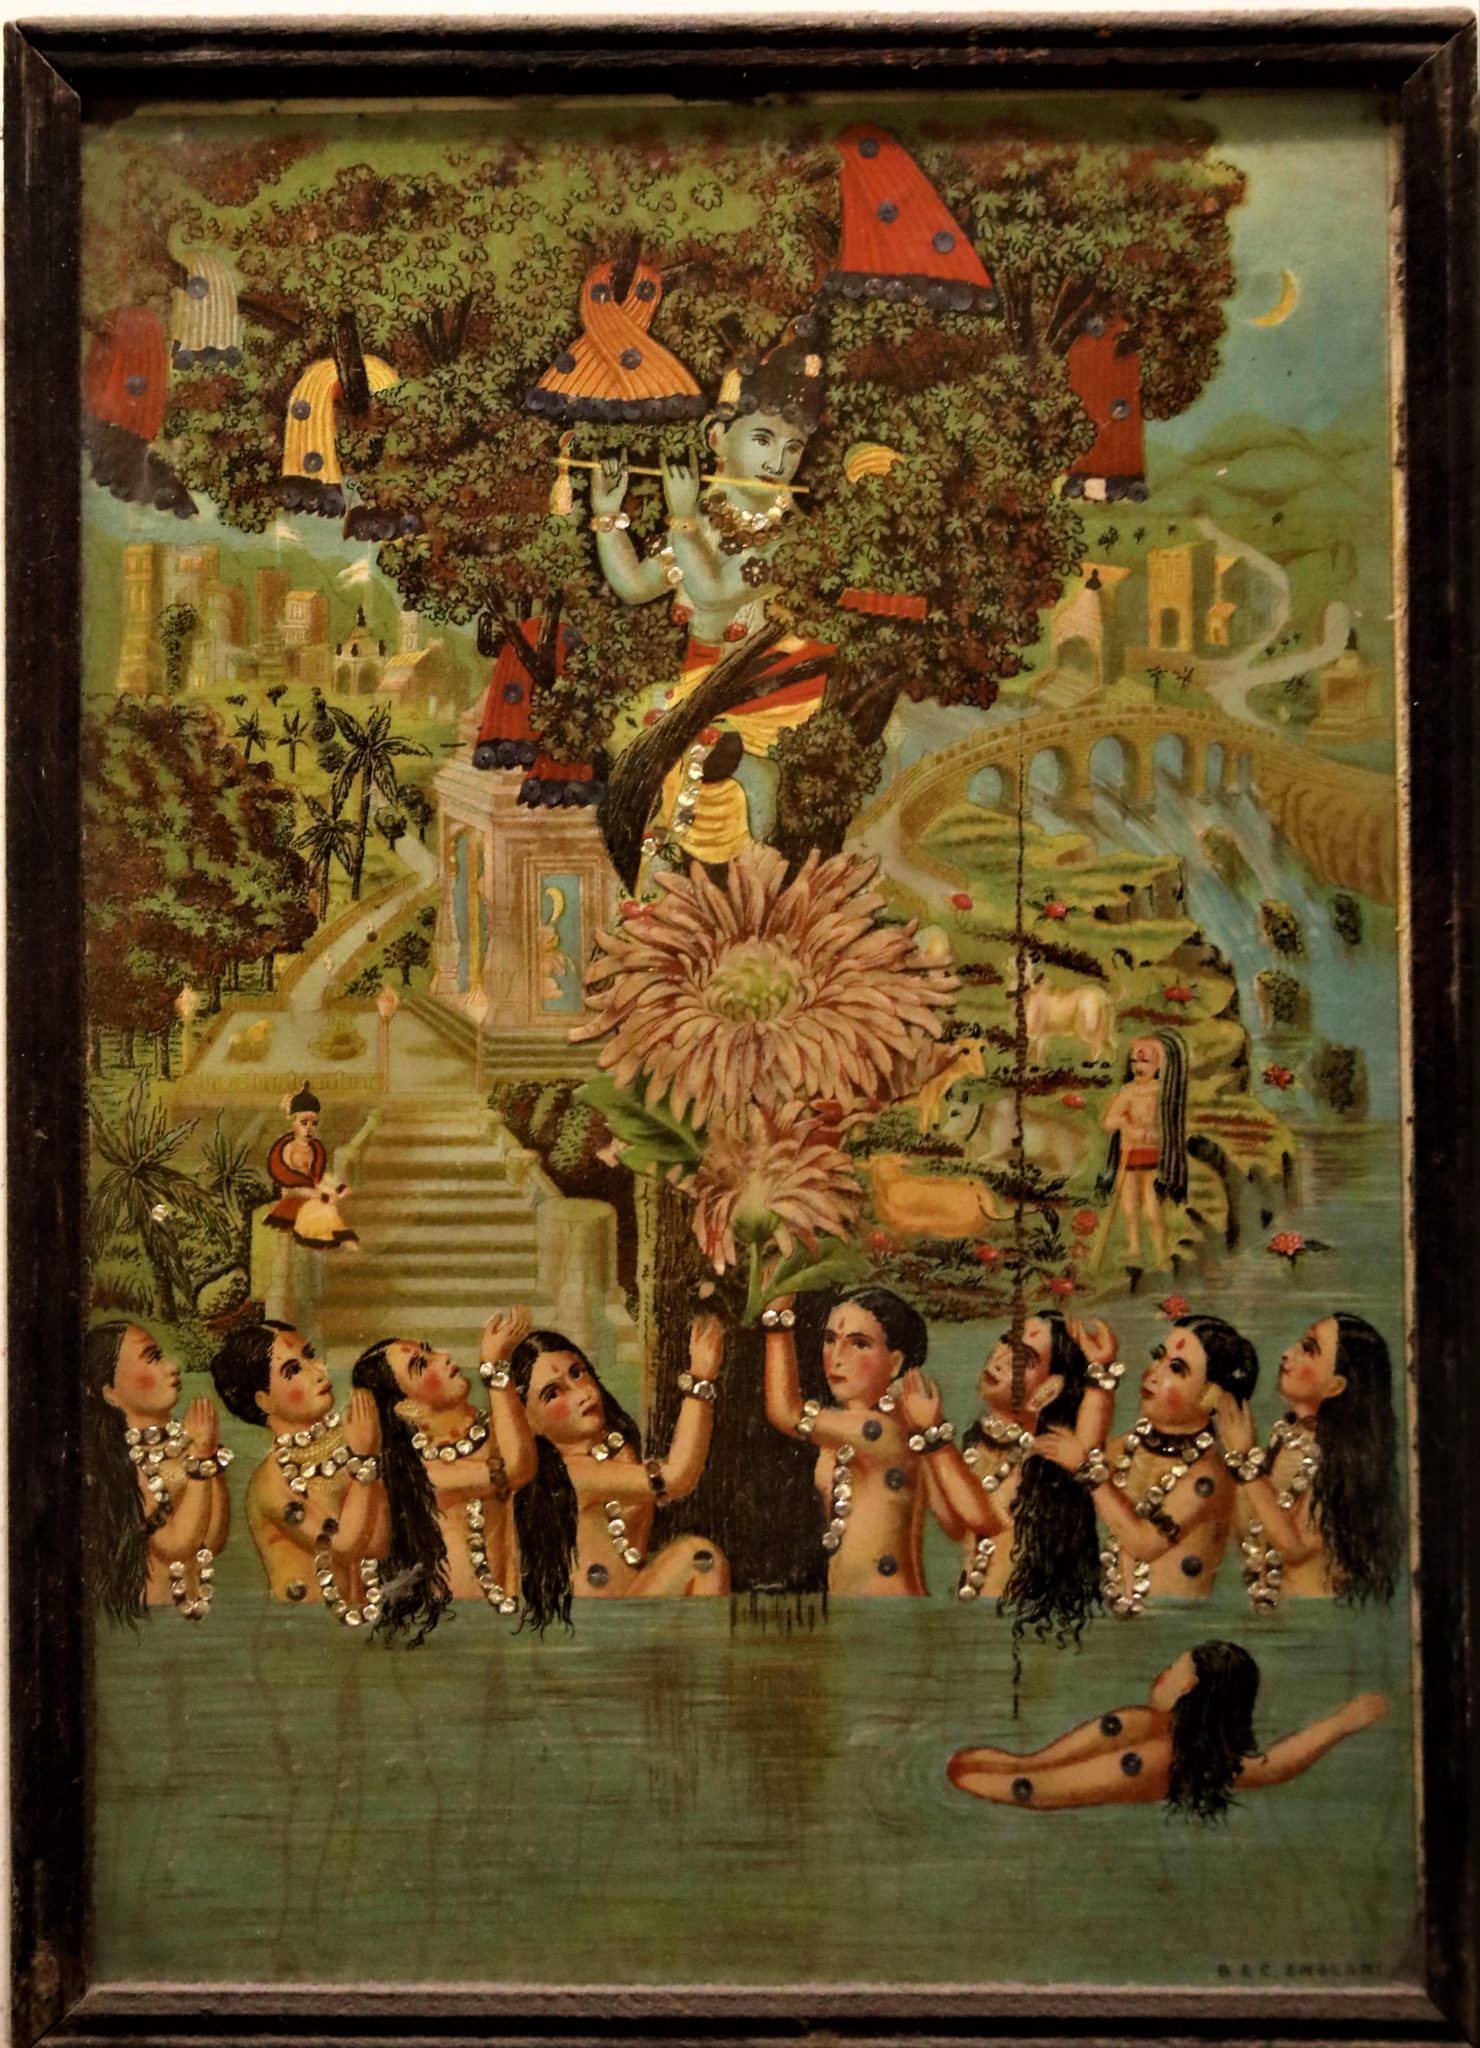 krishna peinture achat paris mes indes galantes